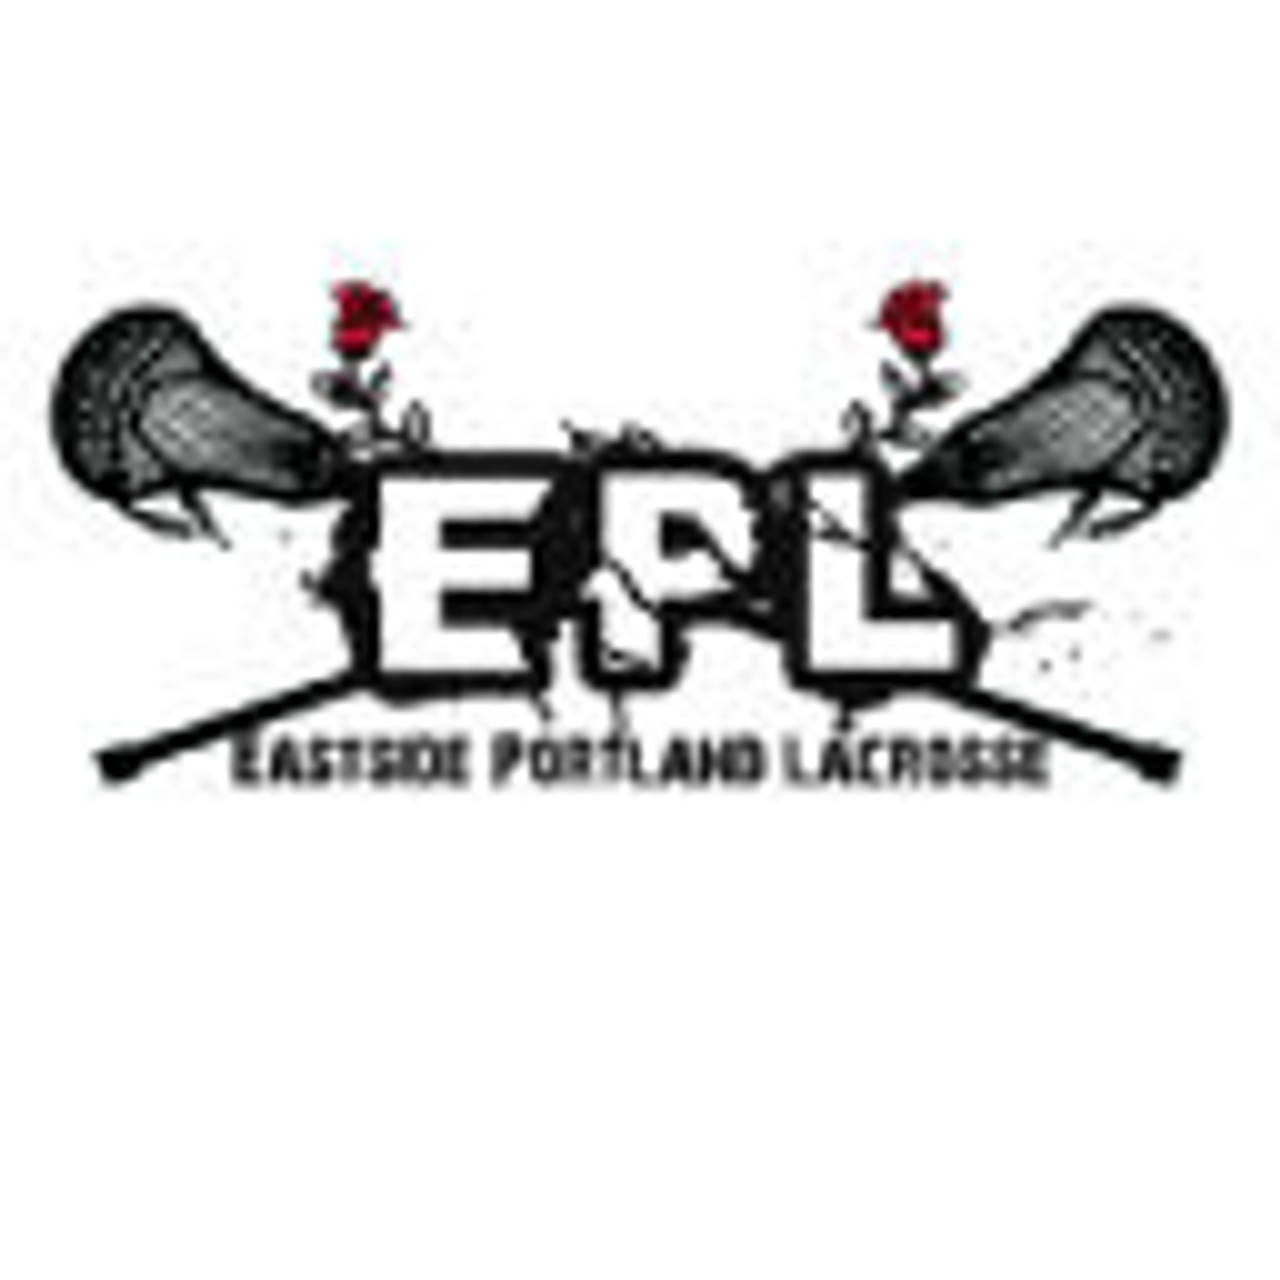 Eastside Portland Lacrosse